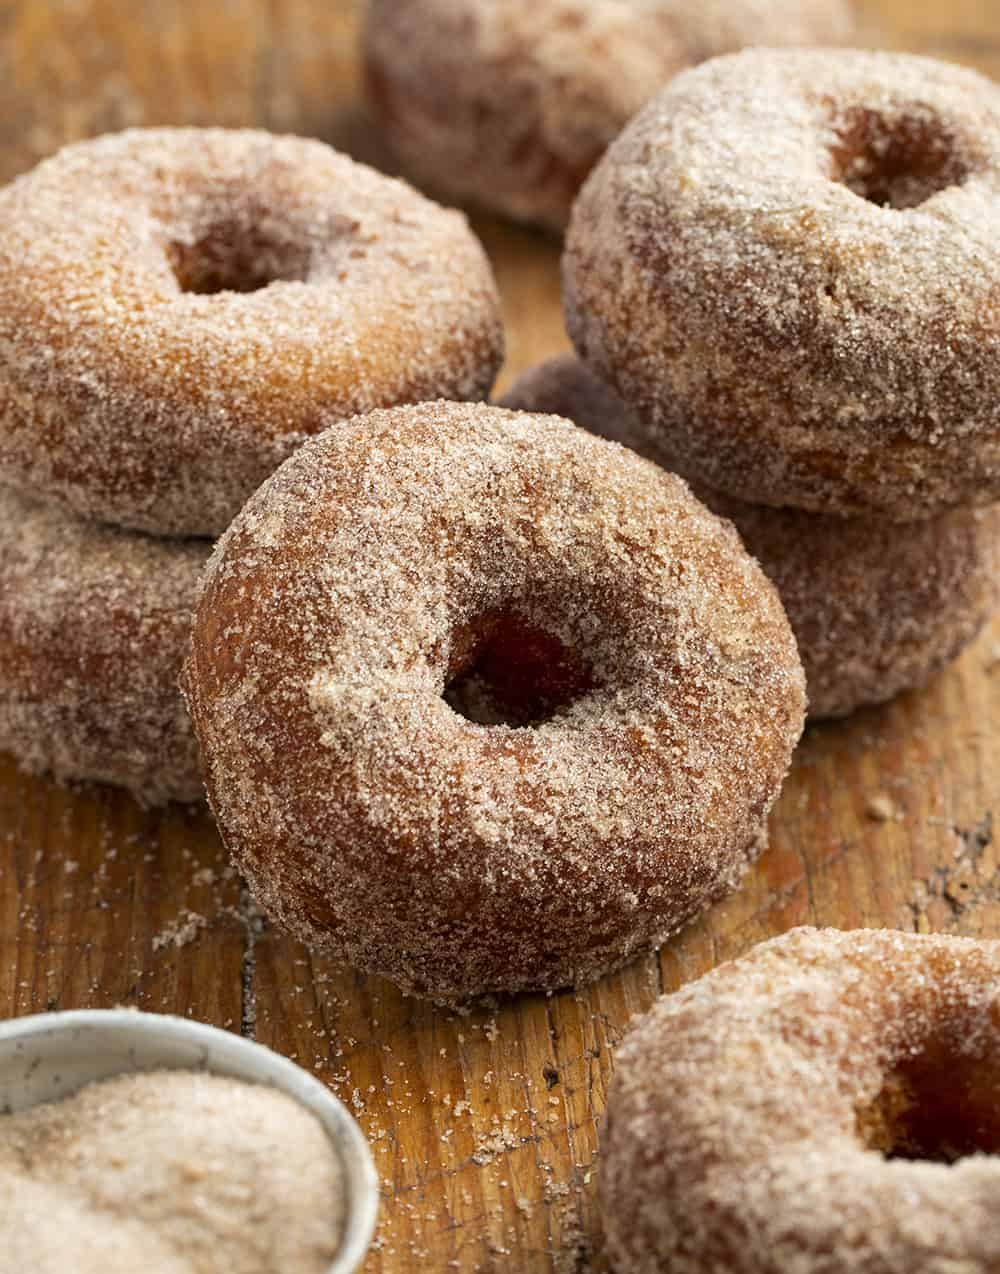 Fried Apple Cider Donuts